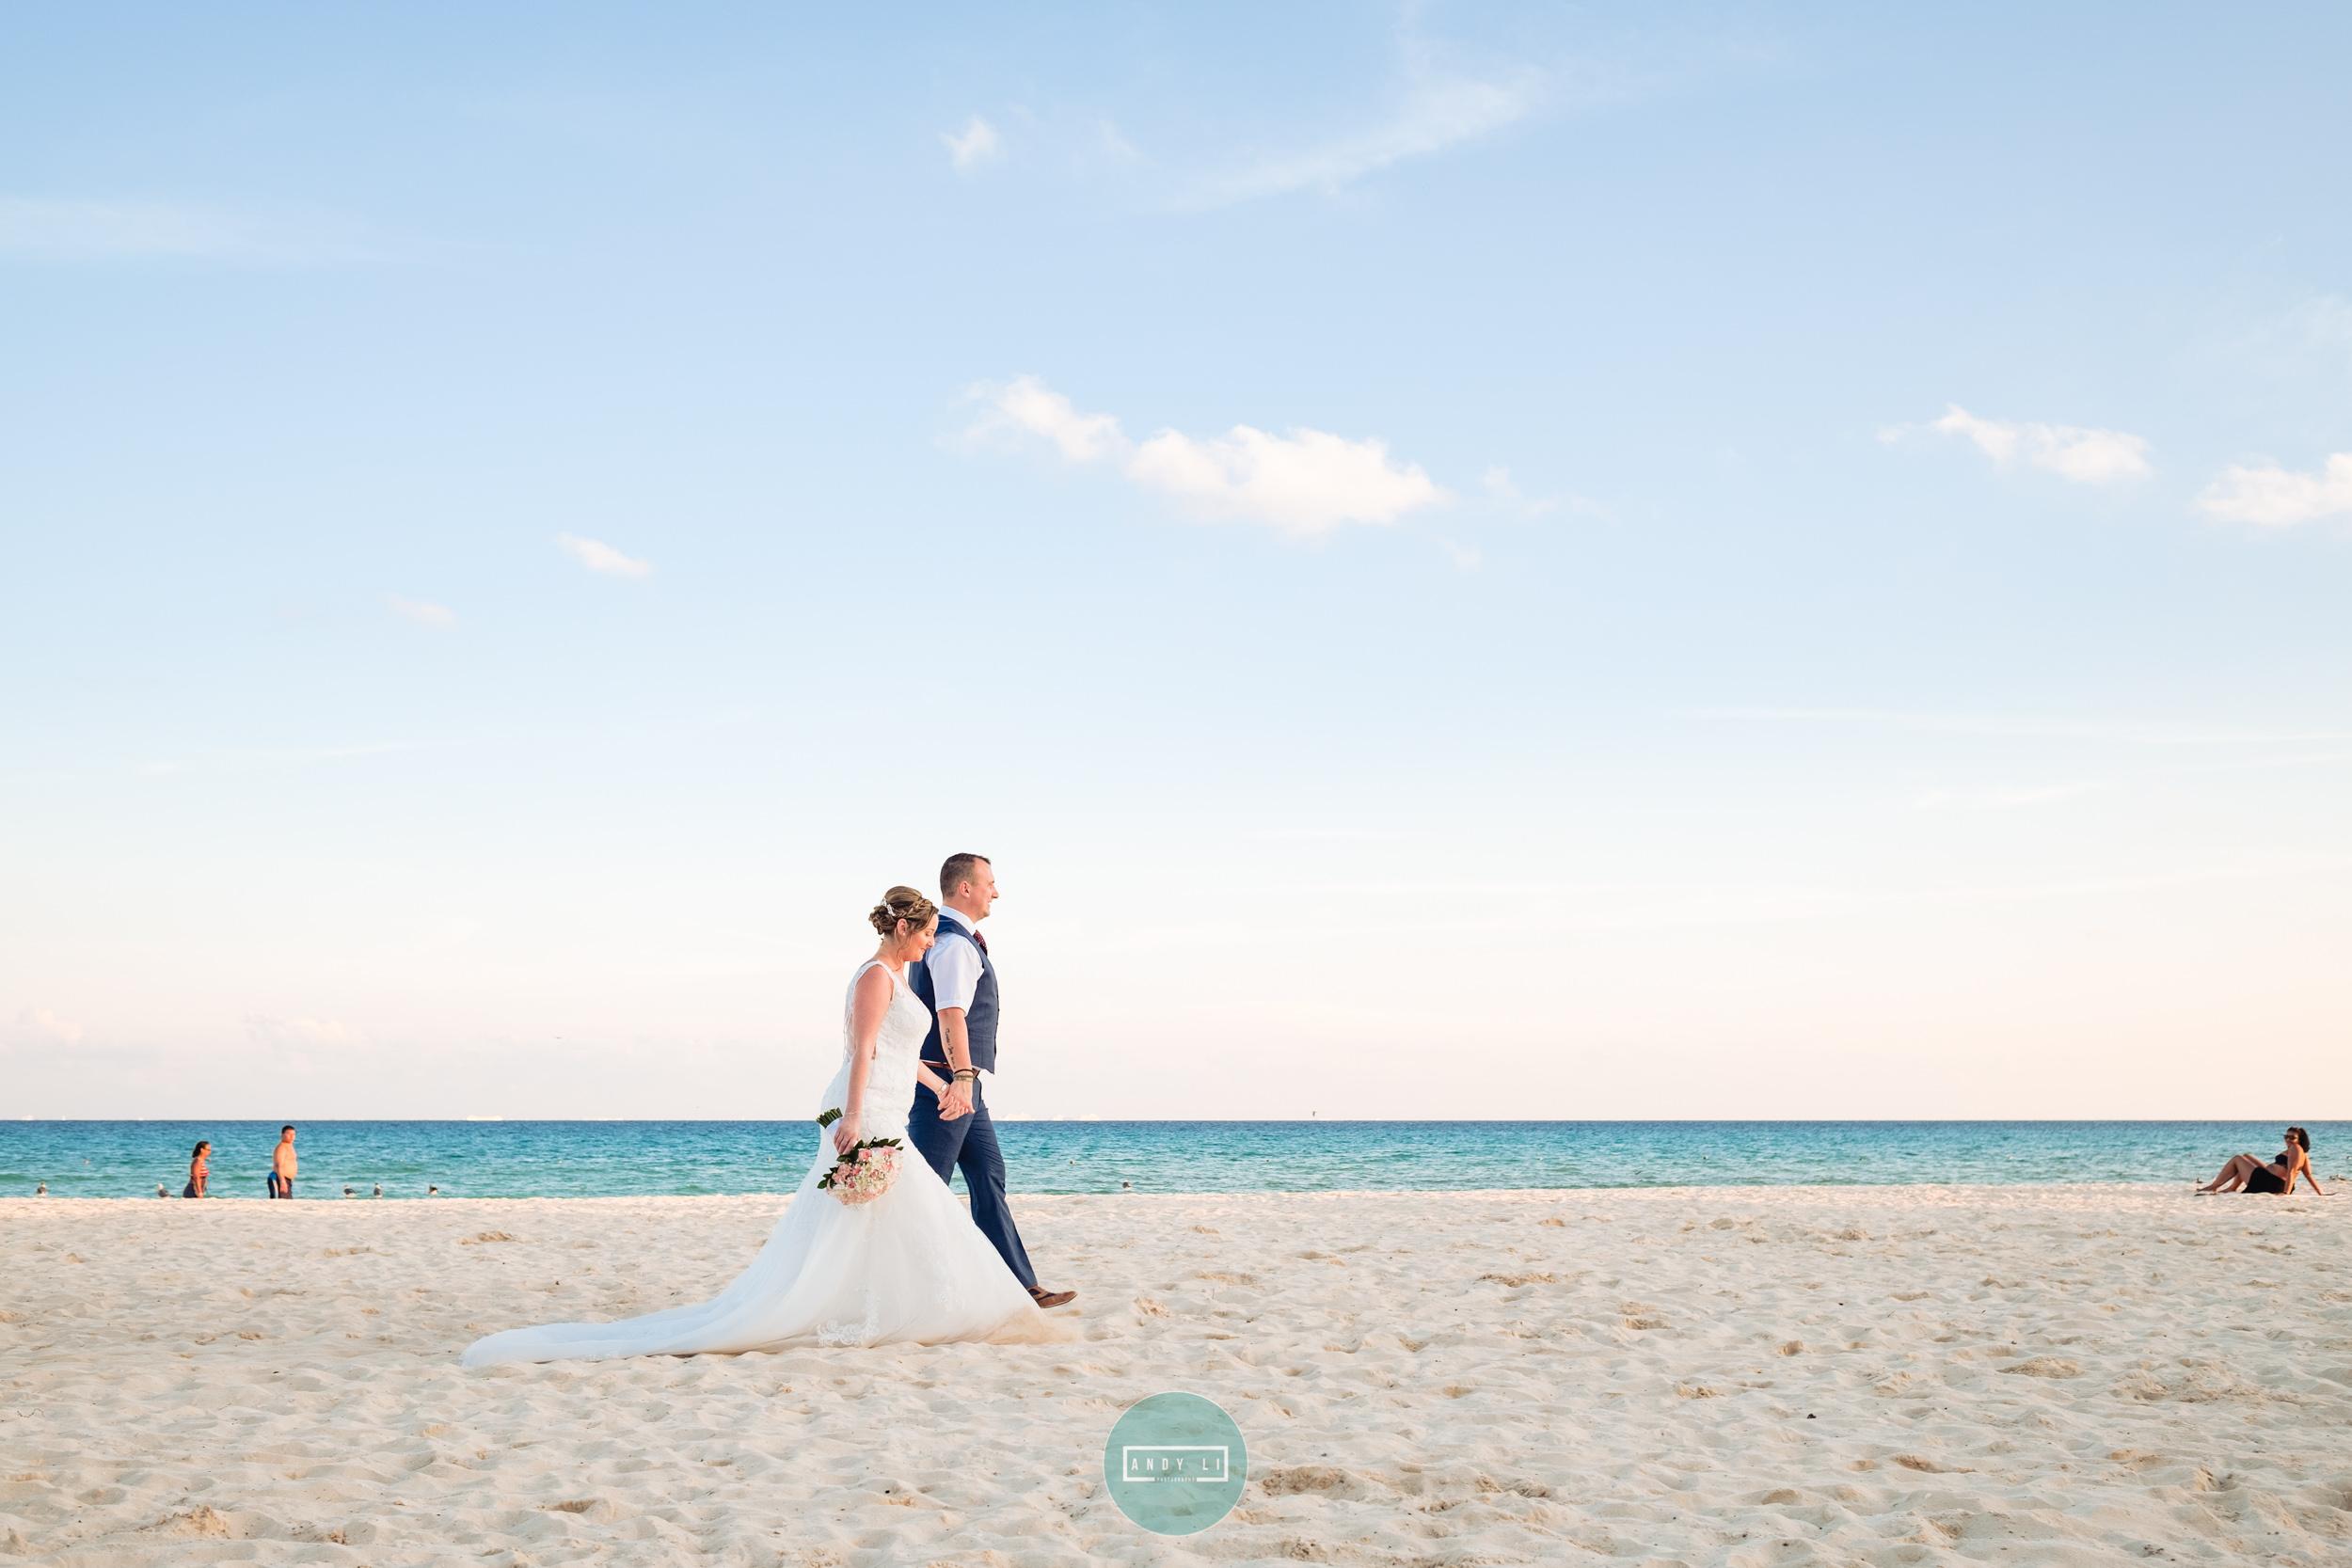 Playa del Carmen Mexico Wedding Photography-038-AXT22818.jpg